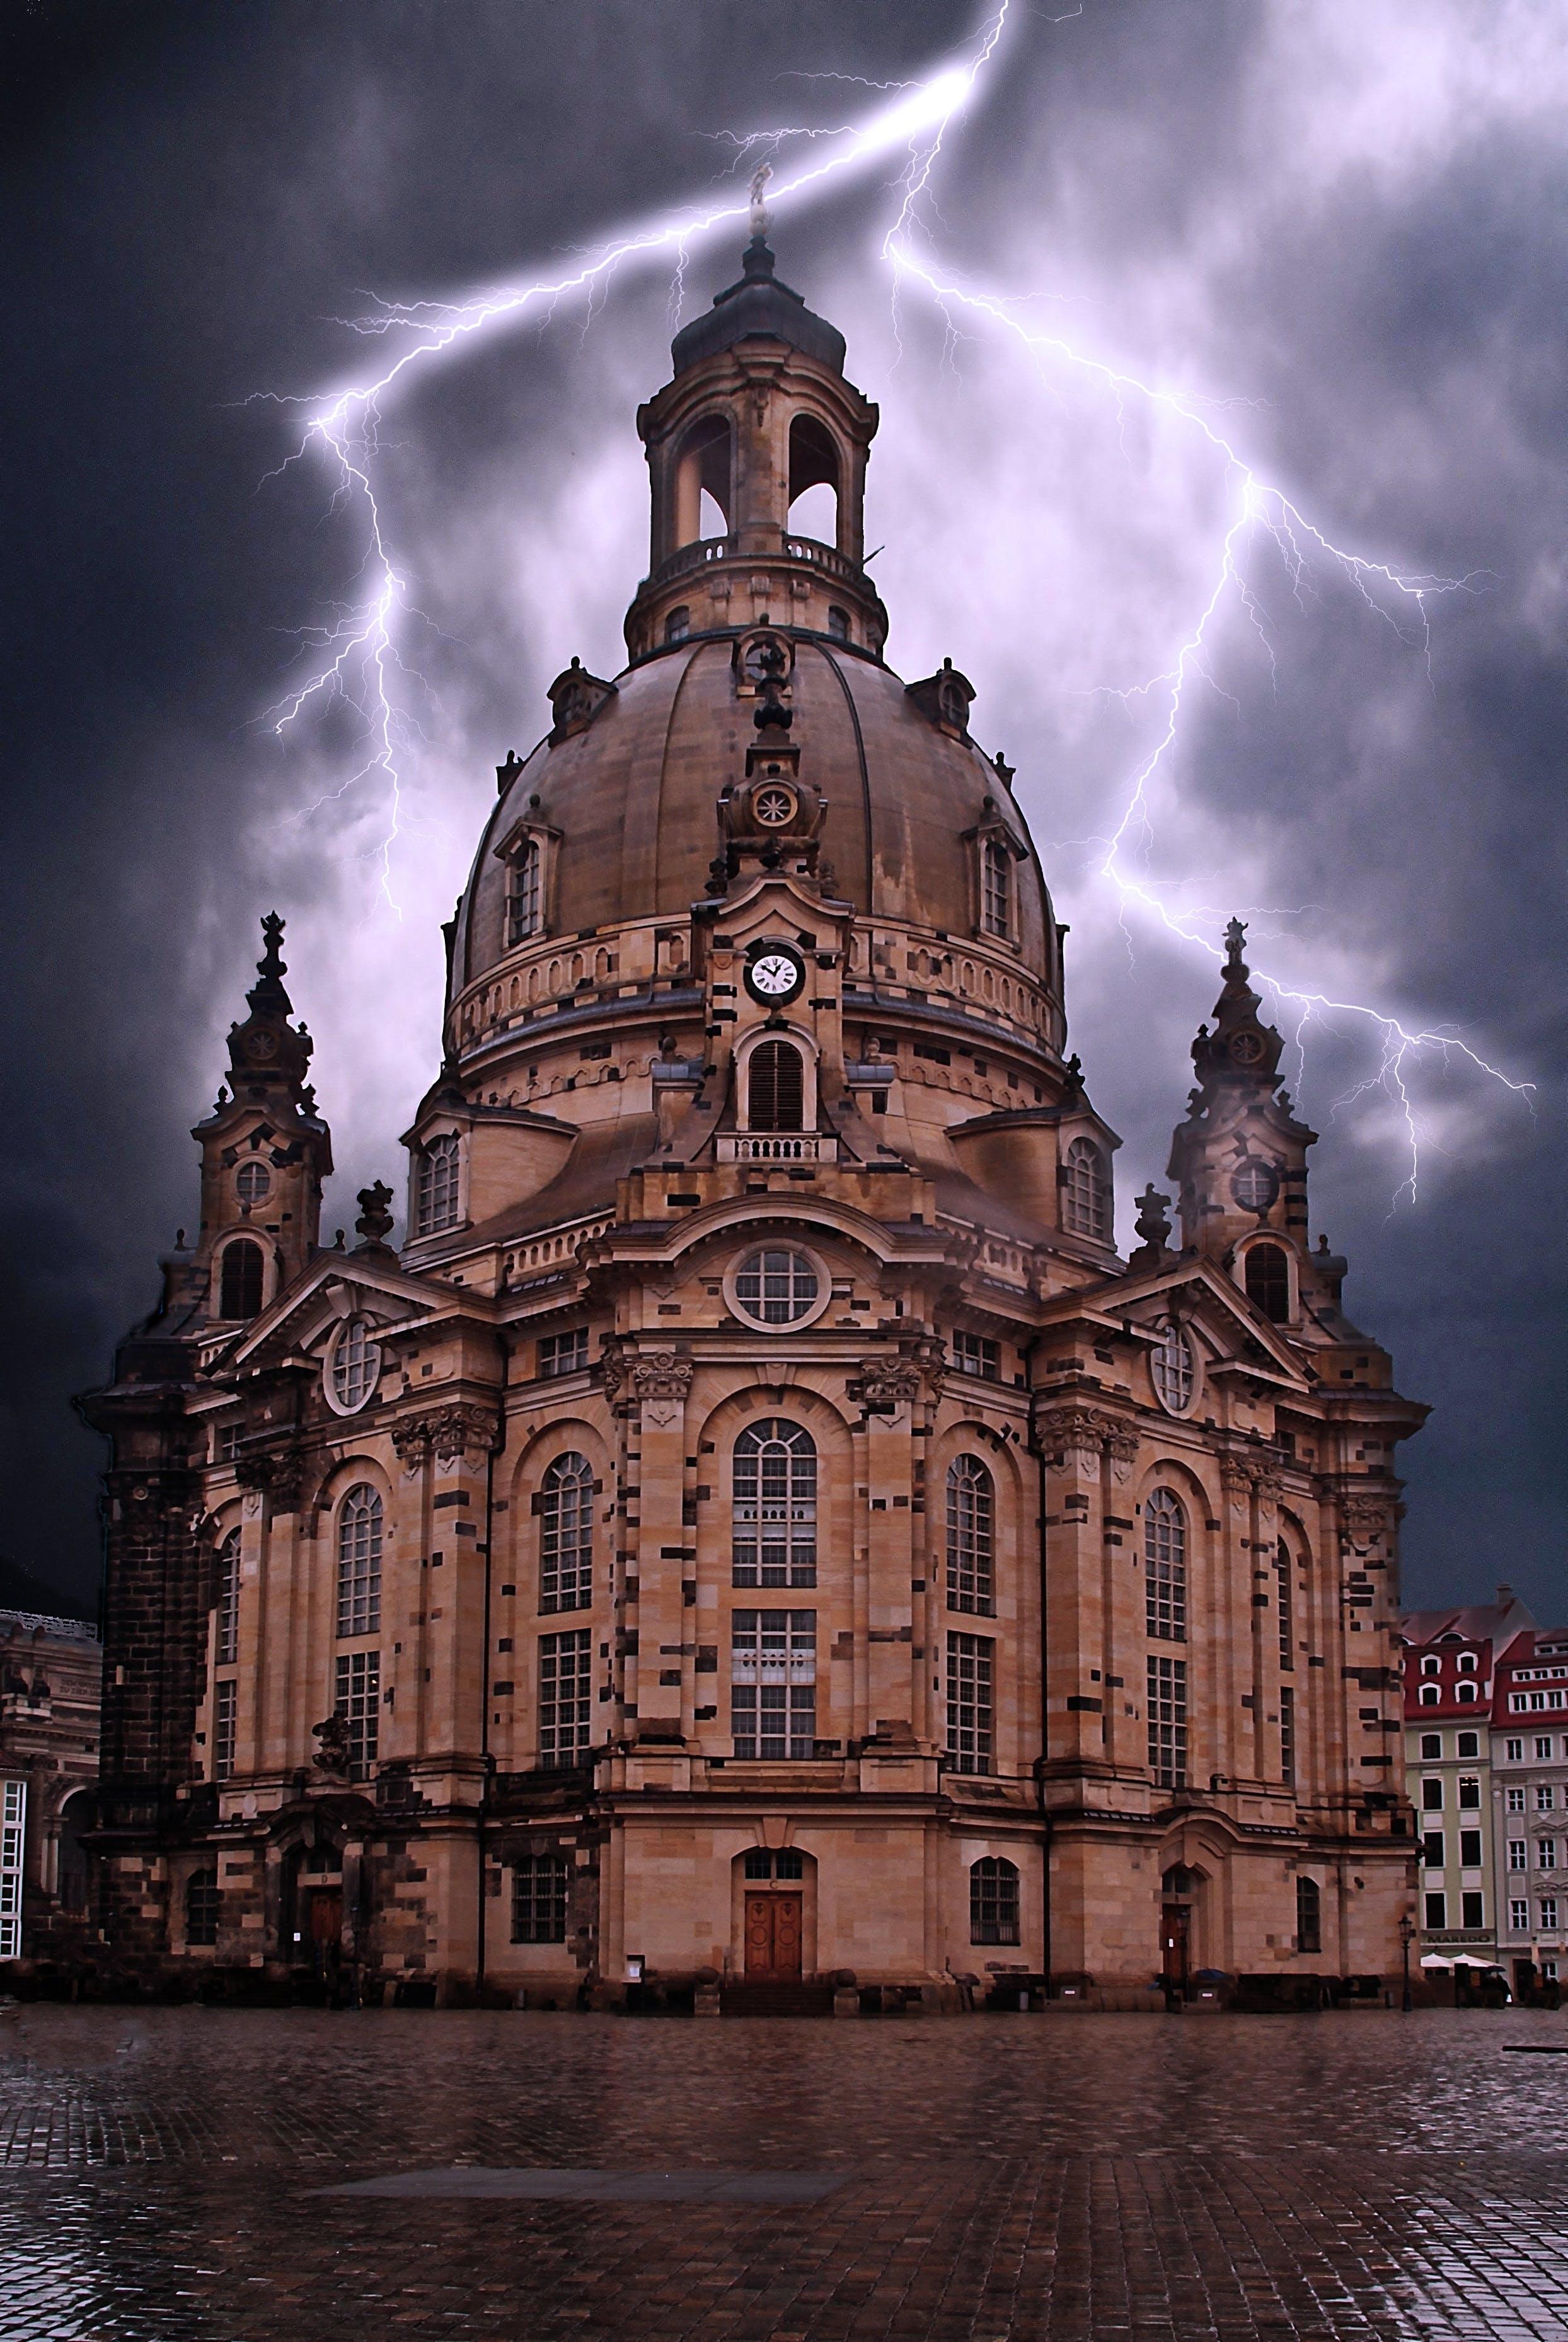 Free stock photo of architecture, rain, wet, church